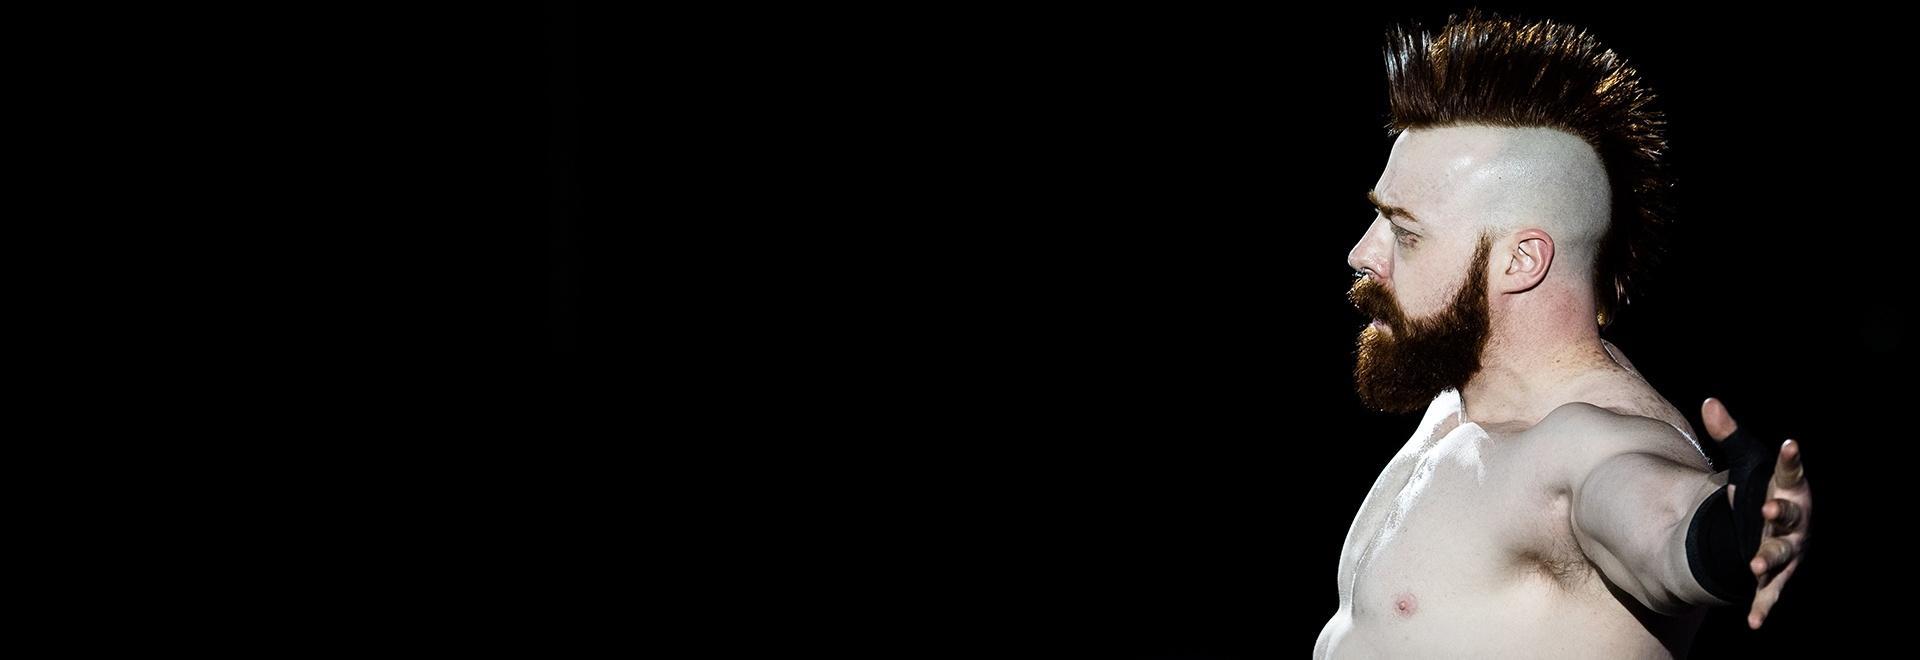 Ep. 26